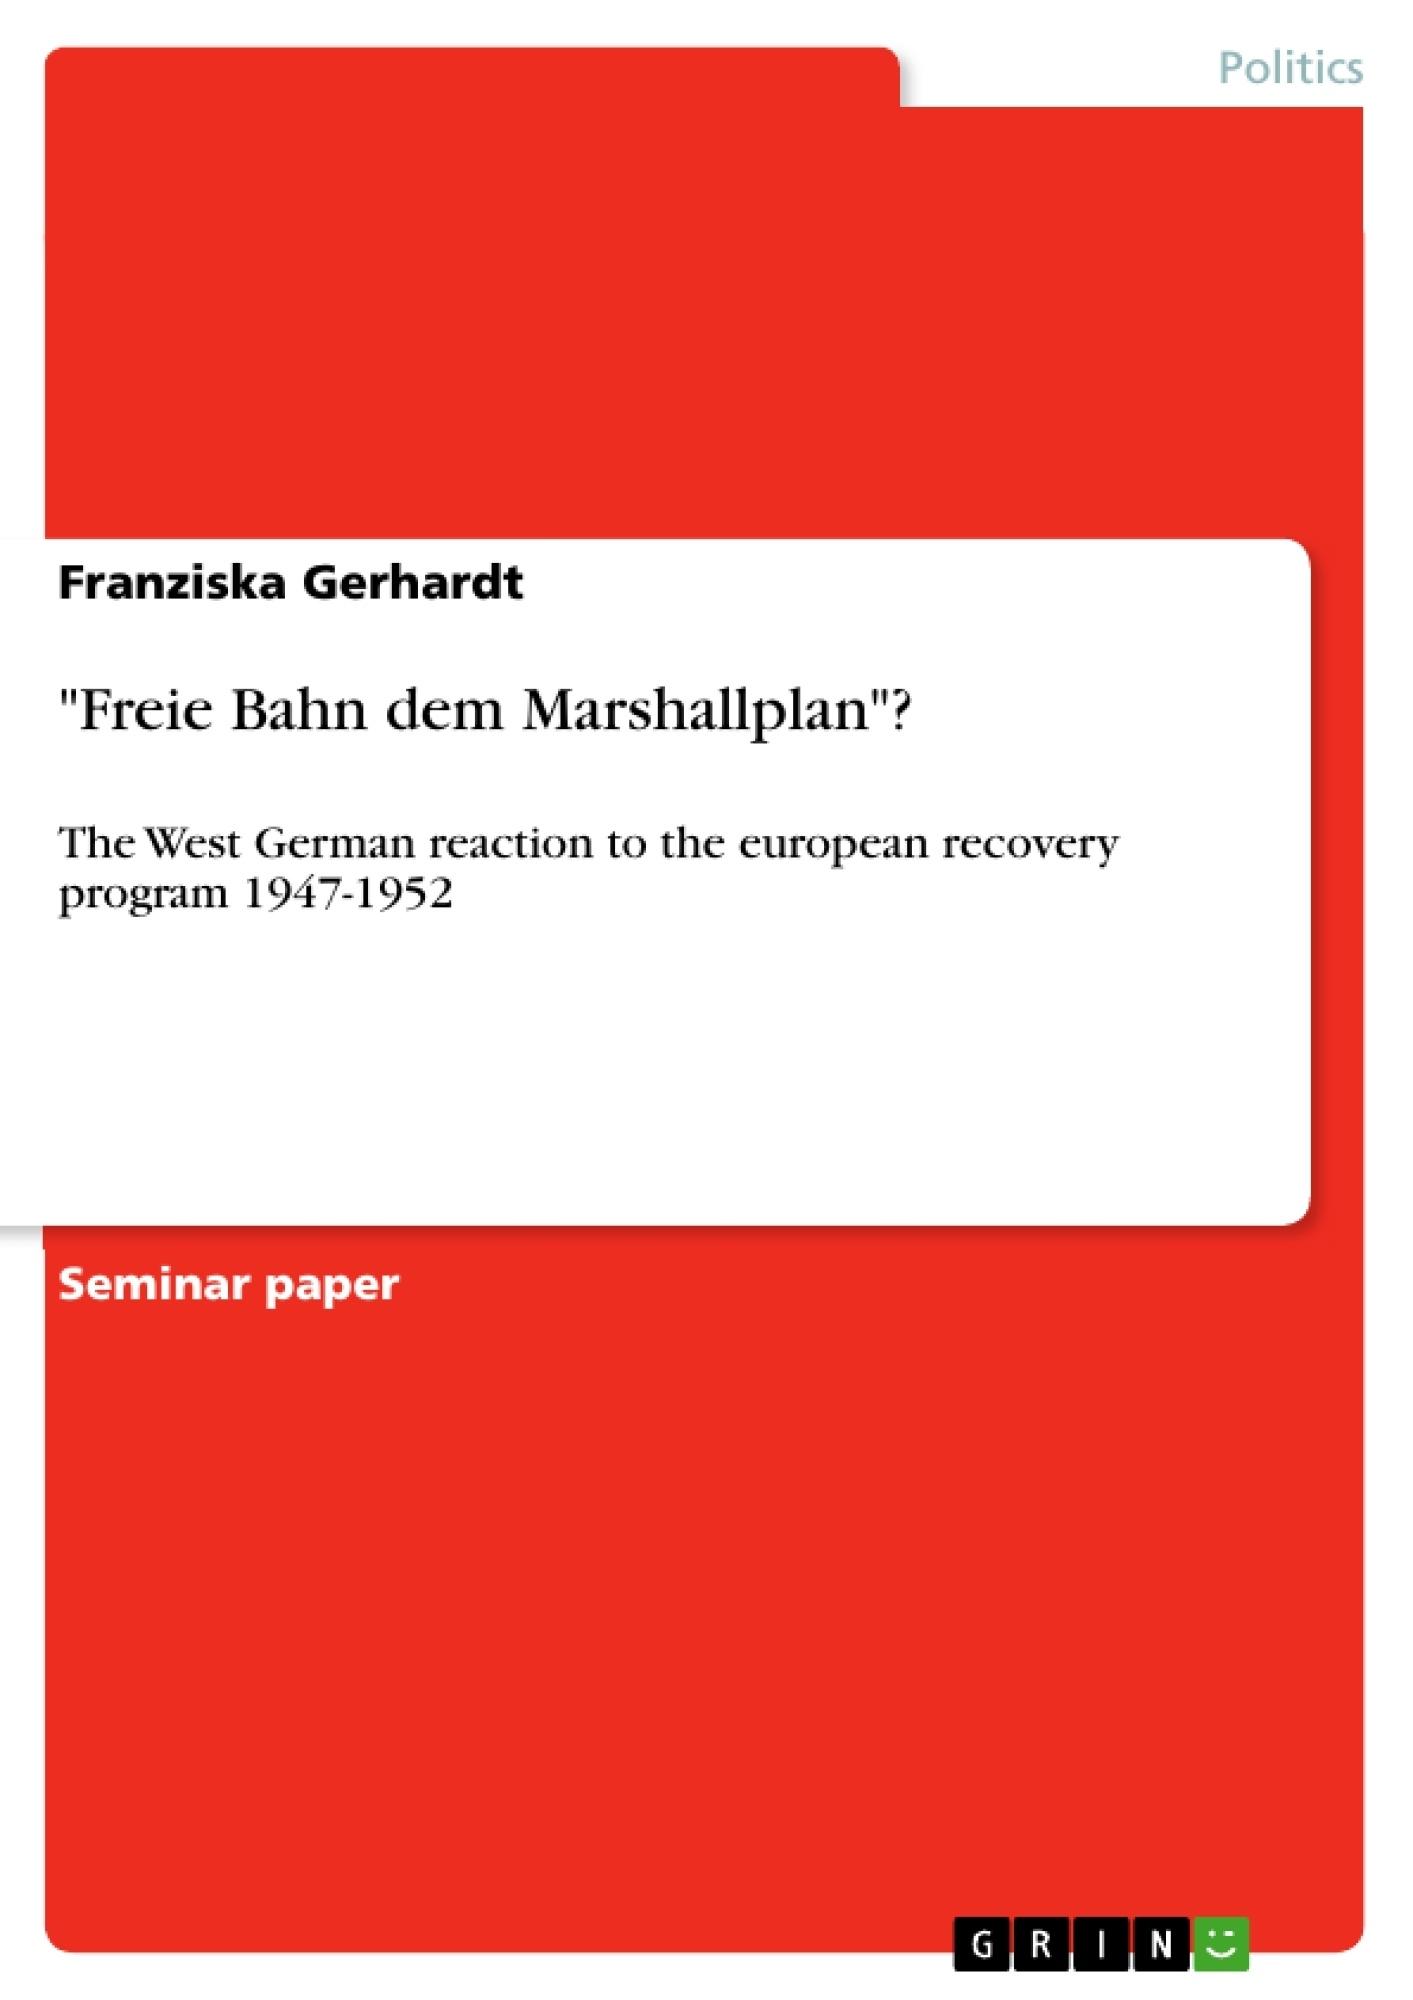 freie bahn dem marshallplan publish your master s thesis publish your master s thesis bachelor s thesis essay or term paper